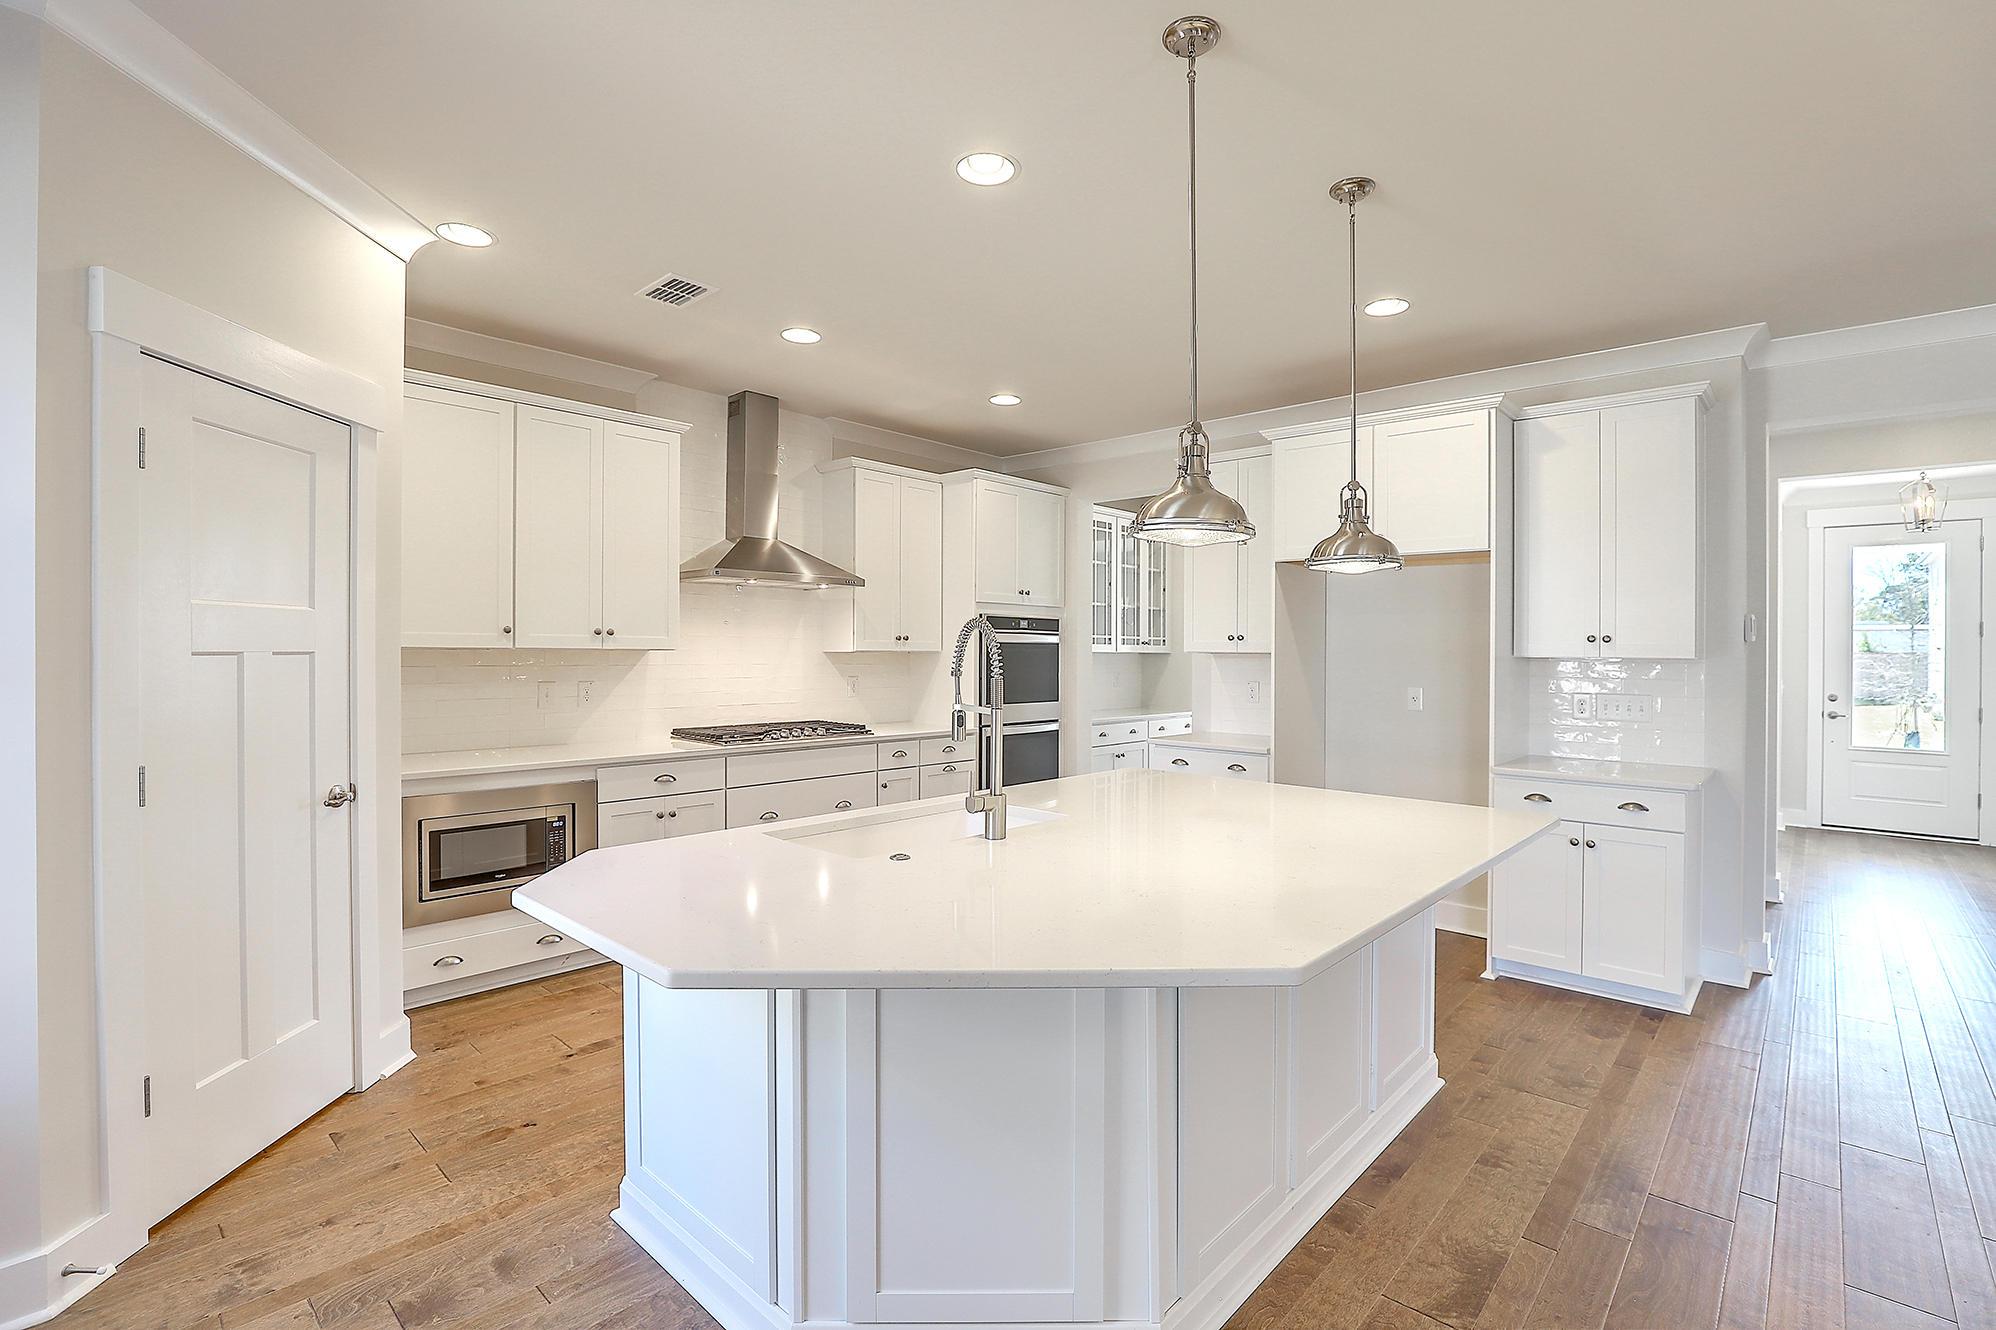 Bentley Park Homes For Sale - 1218 Gannett, Mount Pleasant, SC - 25